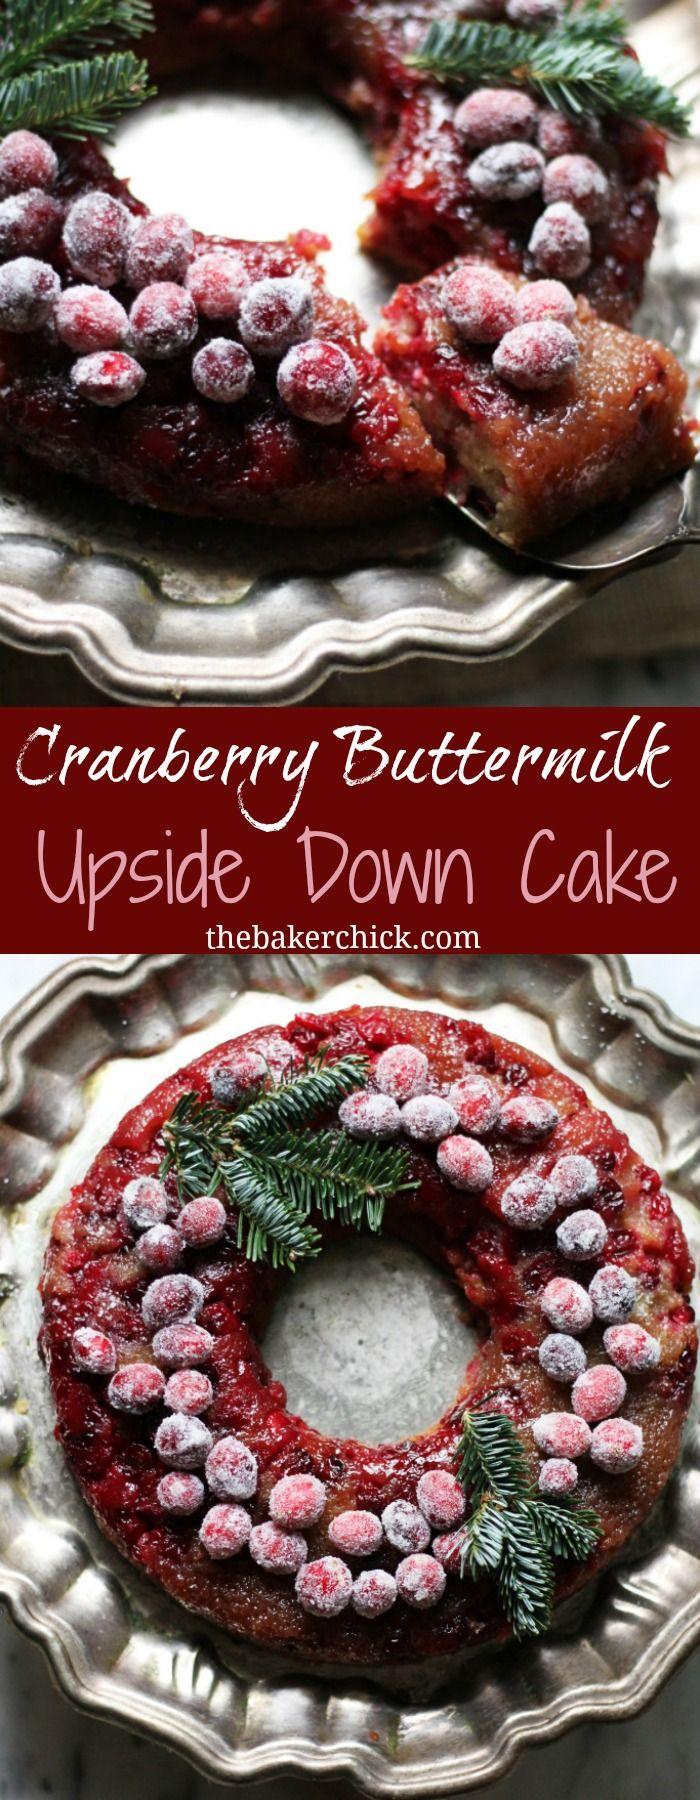 Cranberry Buttermilk Upside Down Cake